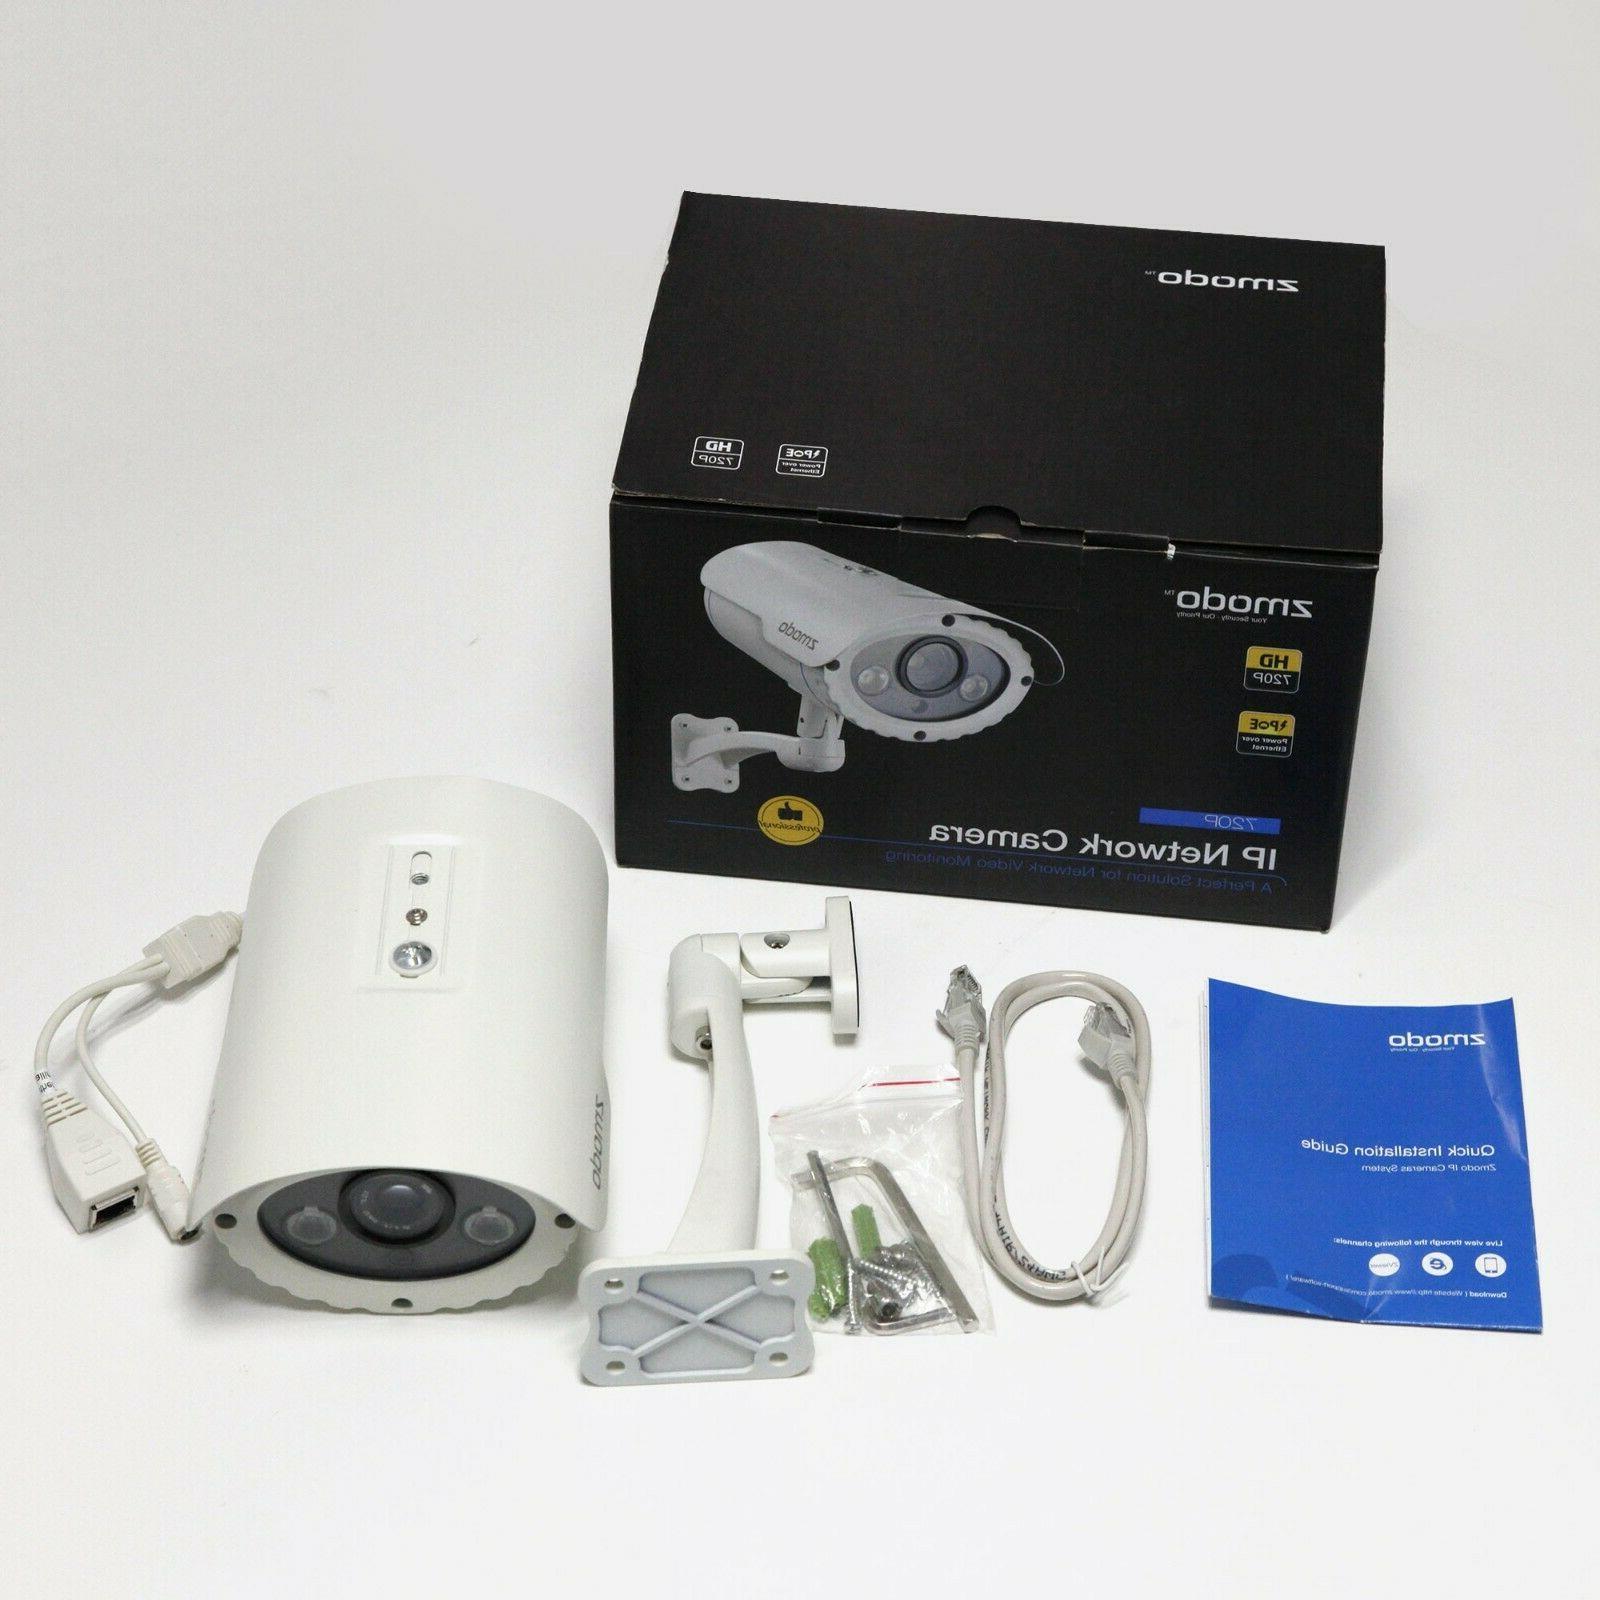 Zmodo 720P Samrt IP Outdoor Camera w/ Clearance